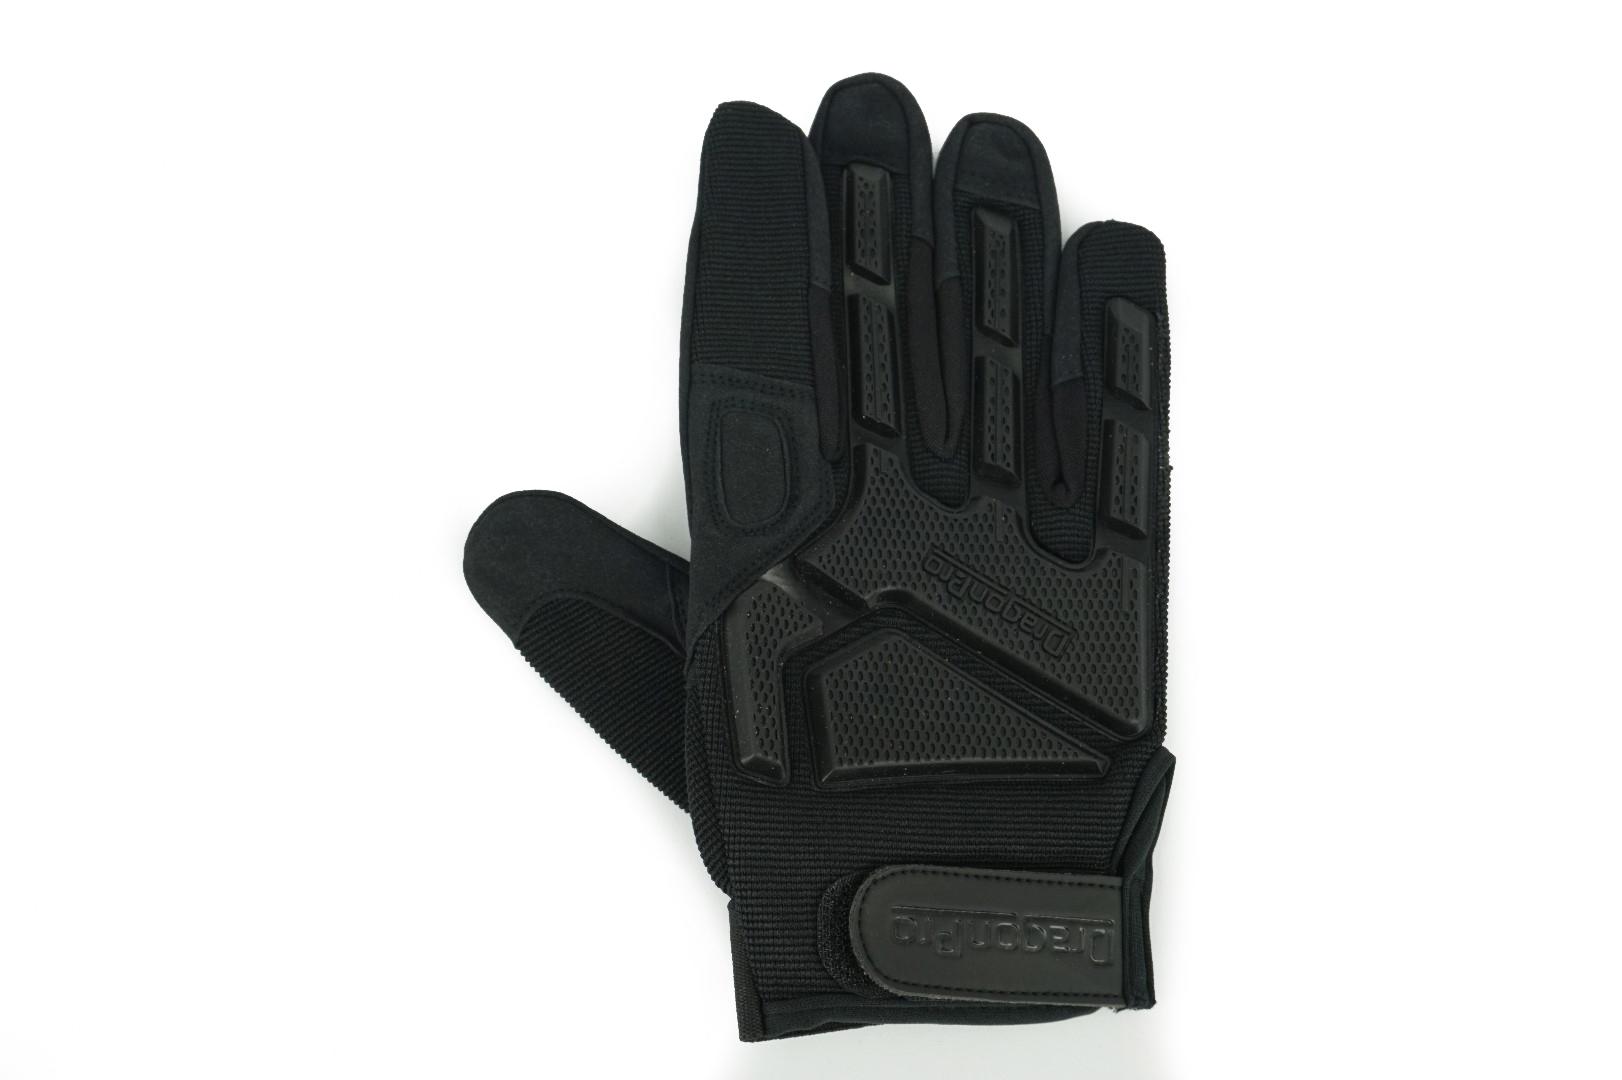 Dragonpro Tactical Assault Glove Iii Black